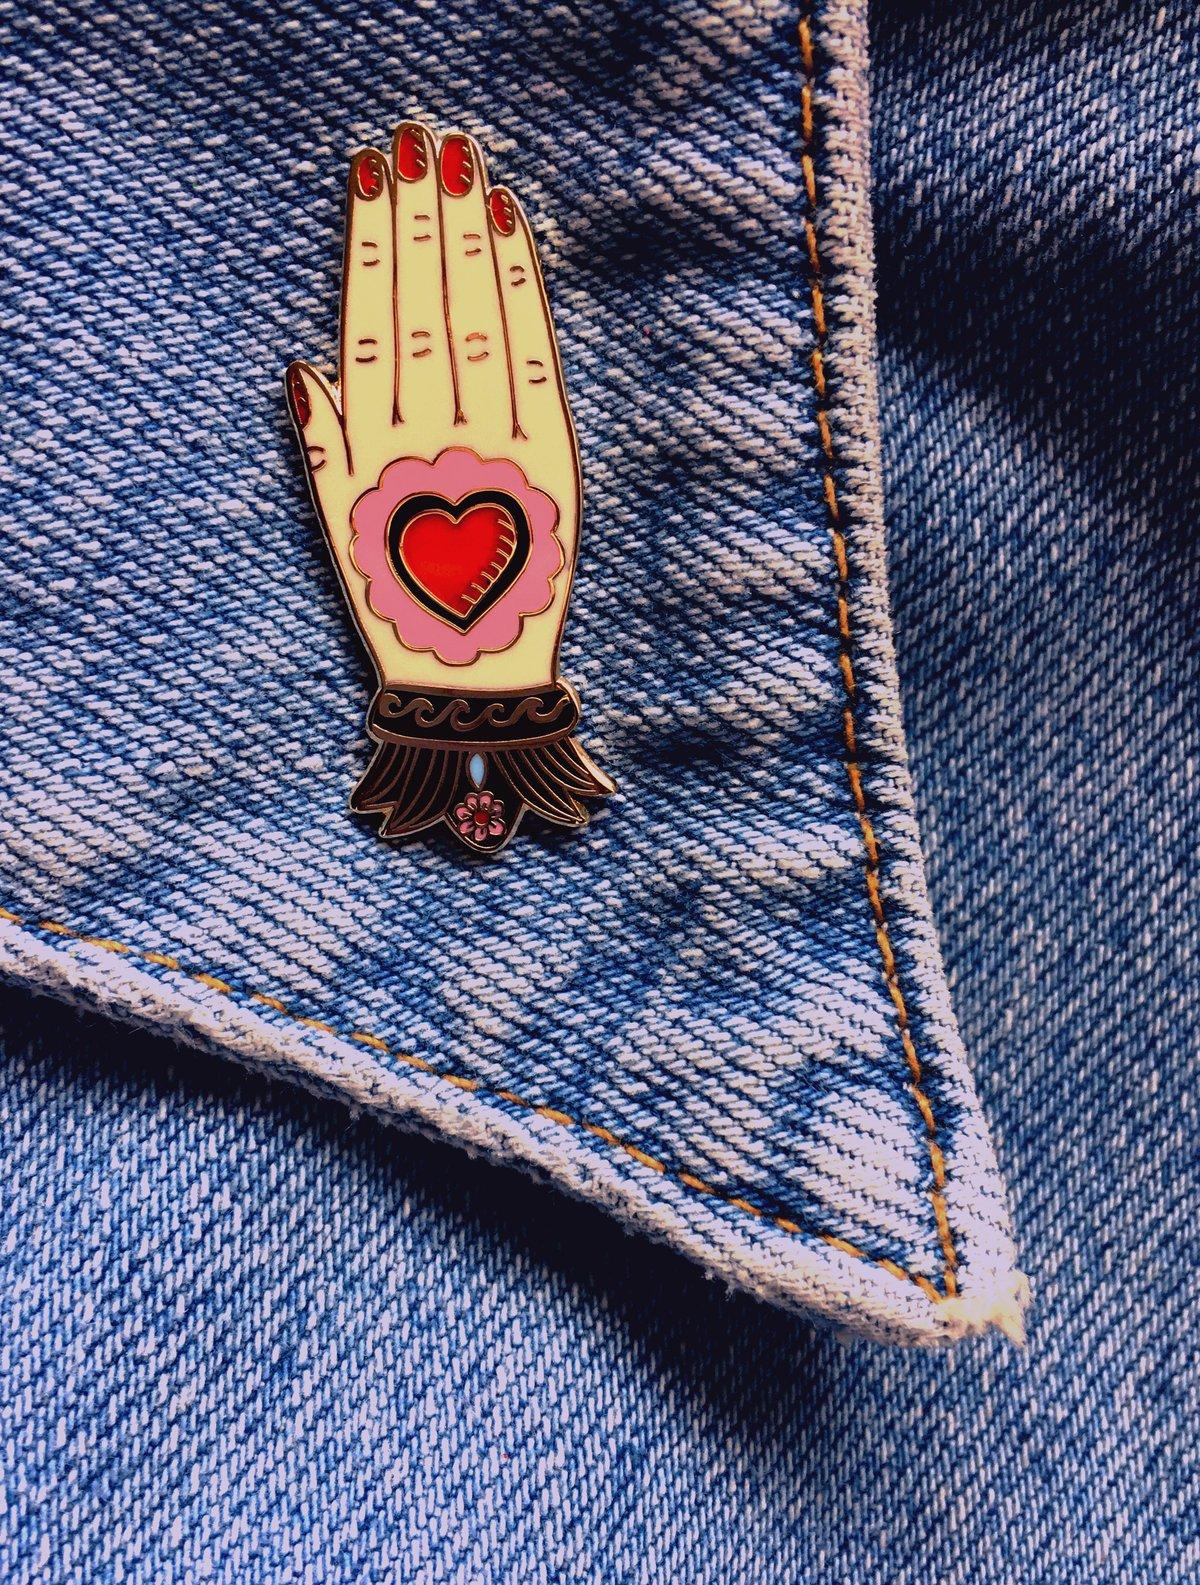 Mexican Hand Enamel Pin - 2 Colour-ways